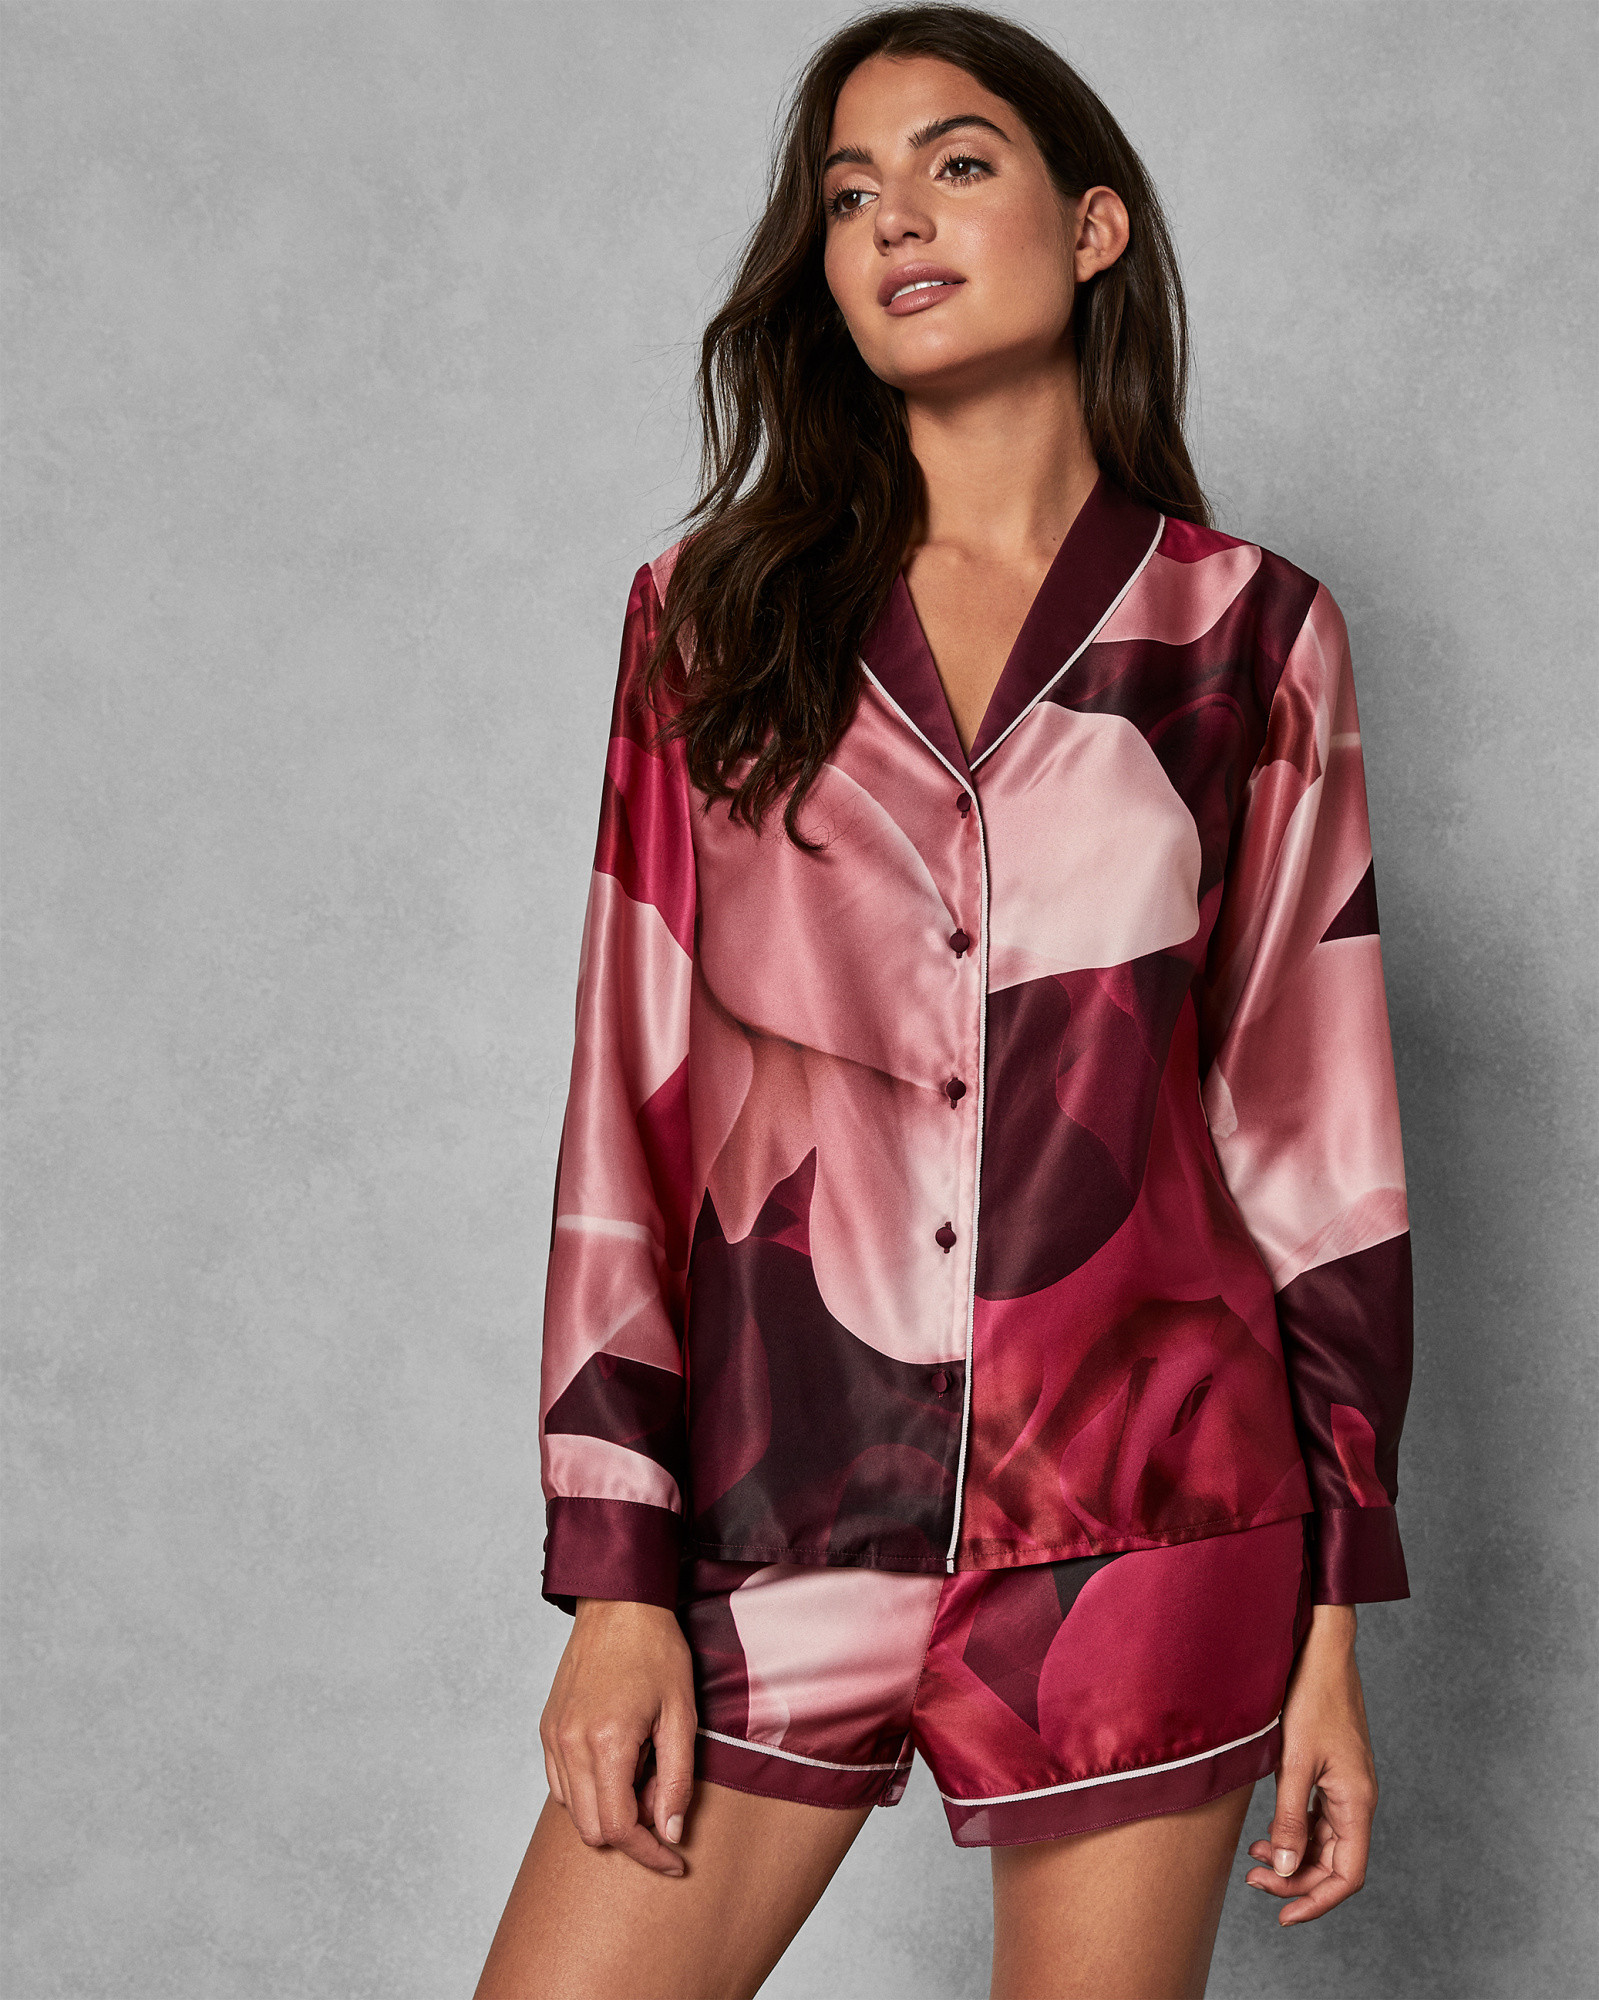 226dce56e2b5 Porcelain Rose Pyjama Shirt | Products in 2019 | Pajama shirt, Ted ...